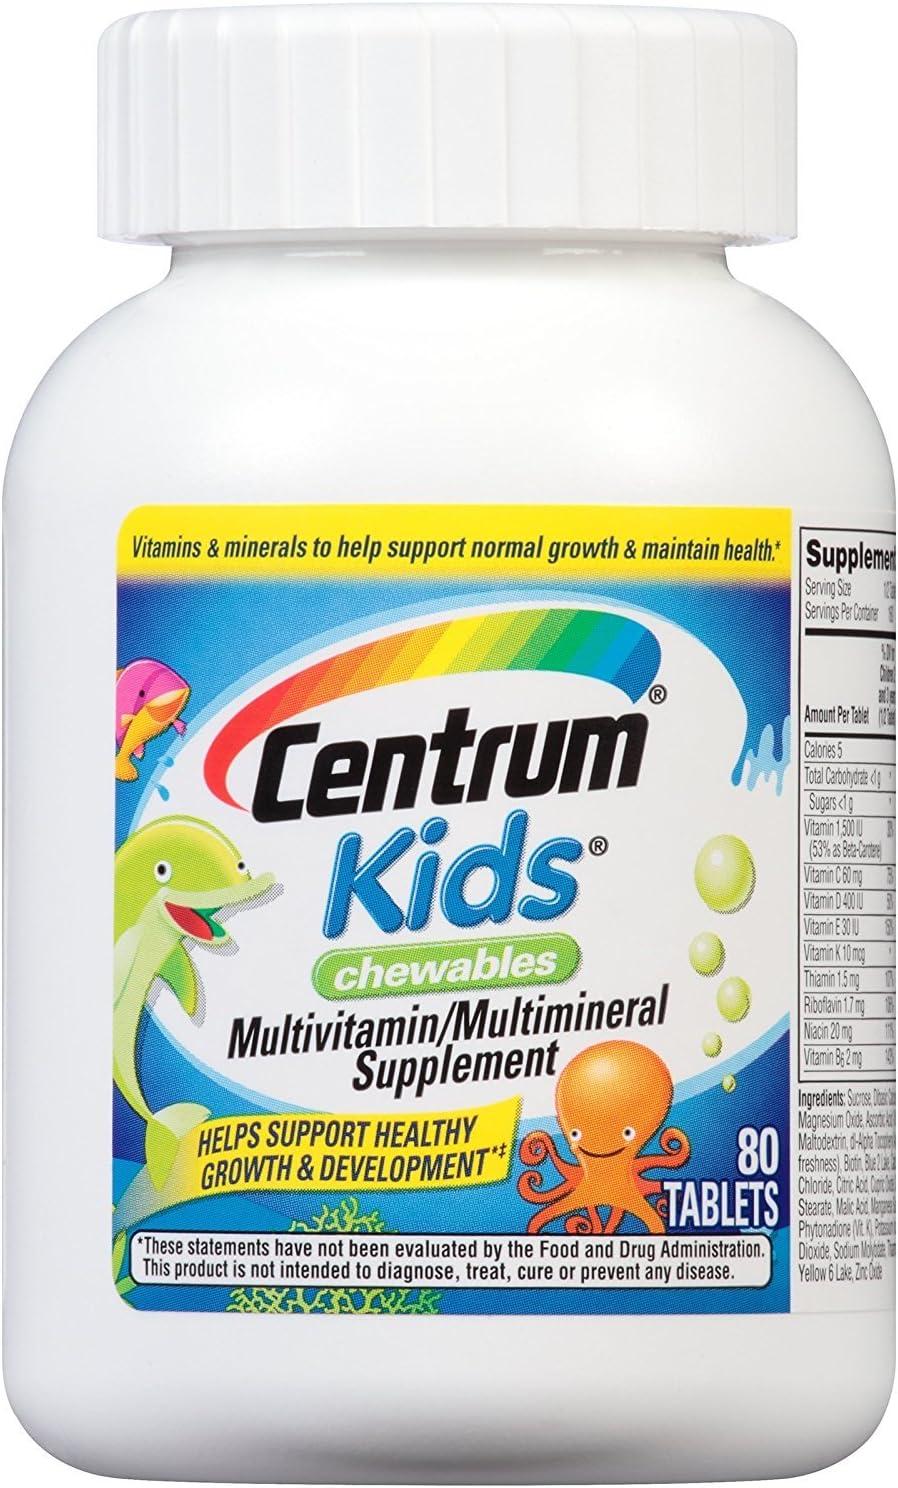 Centrum Kids Chewable Tablets 80 Tablets Pack of 4